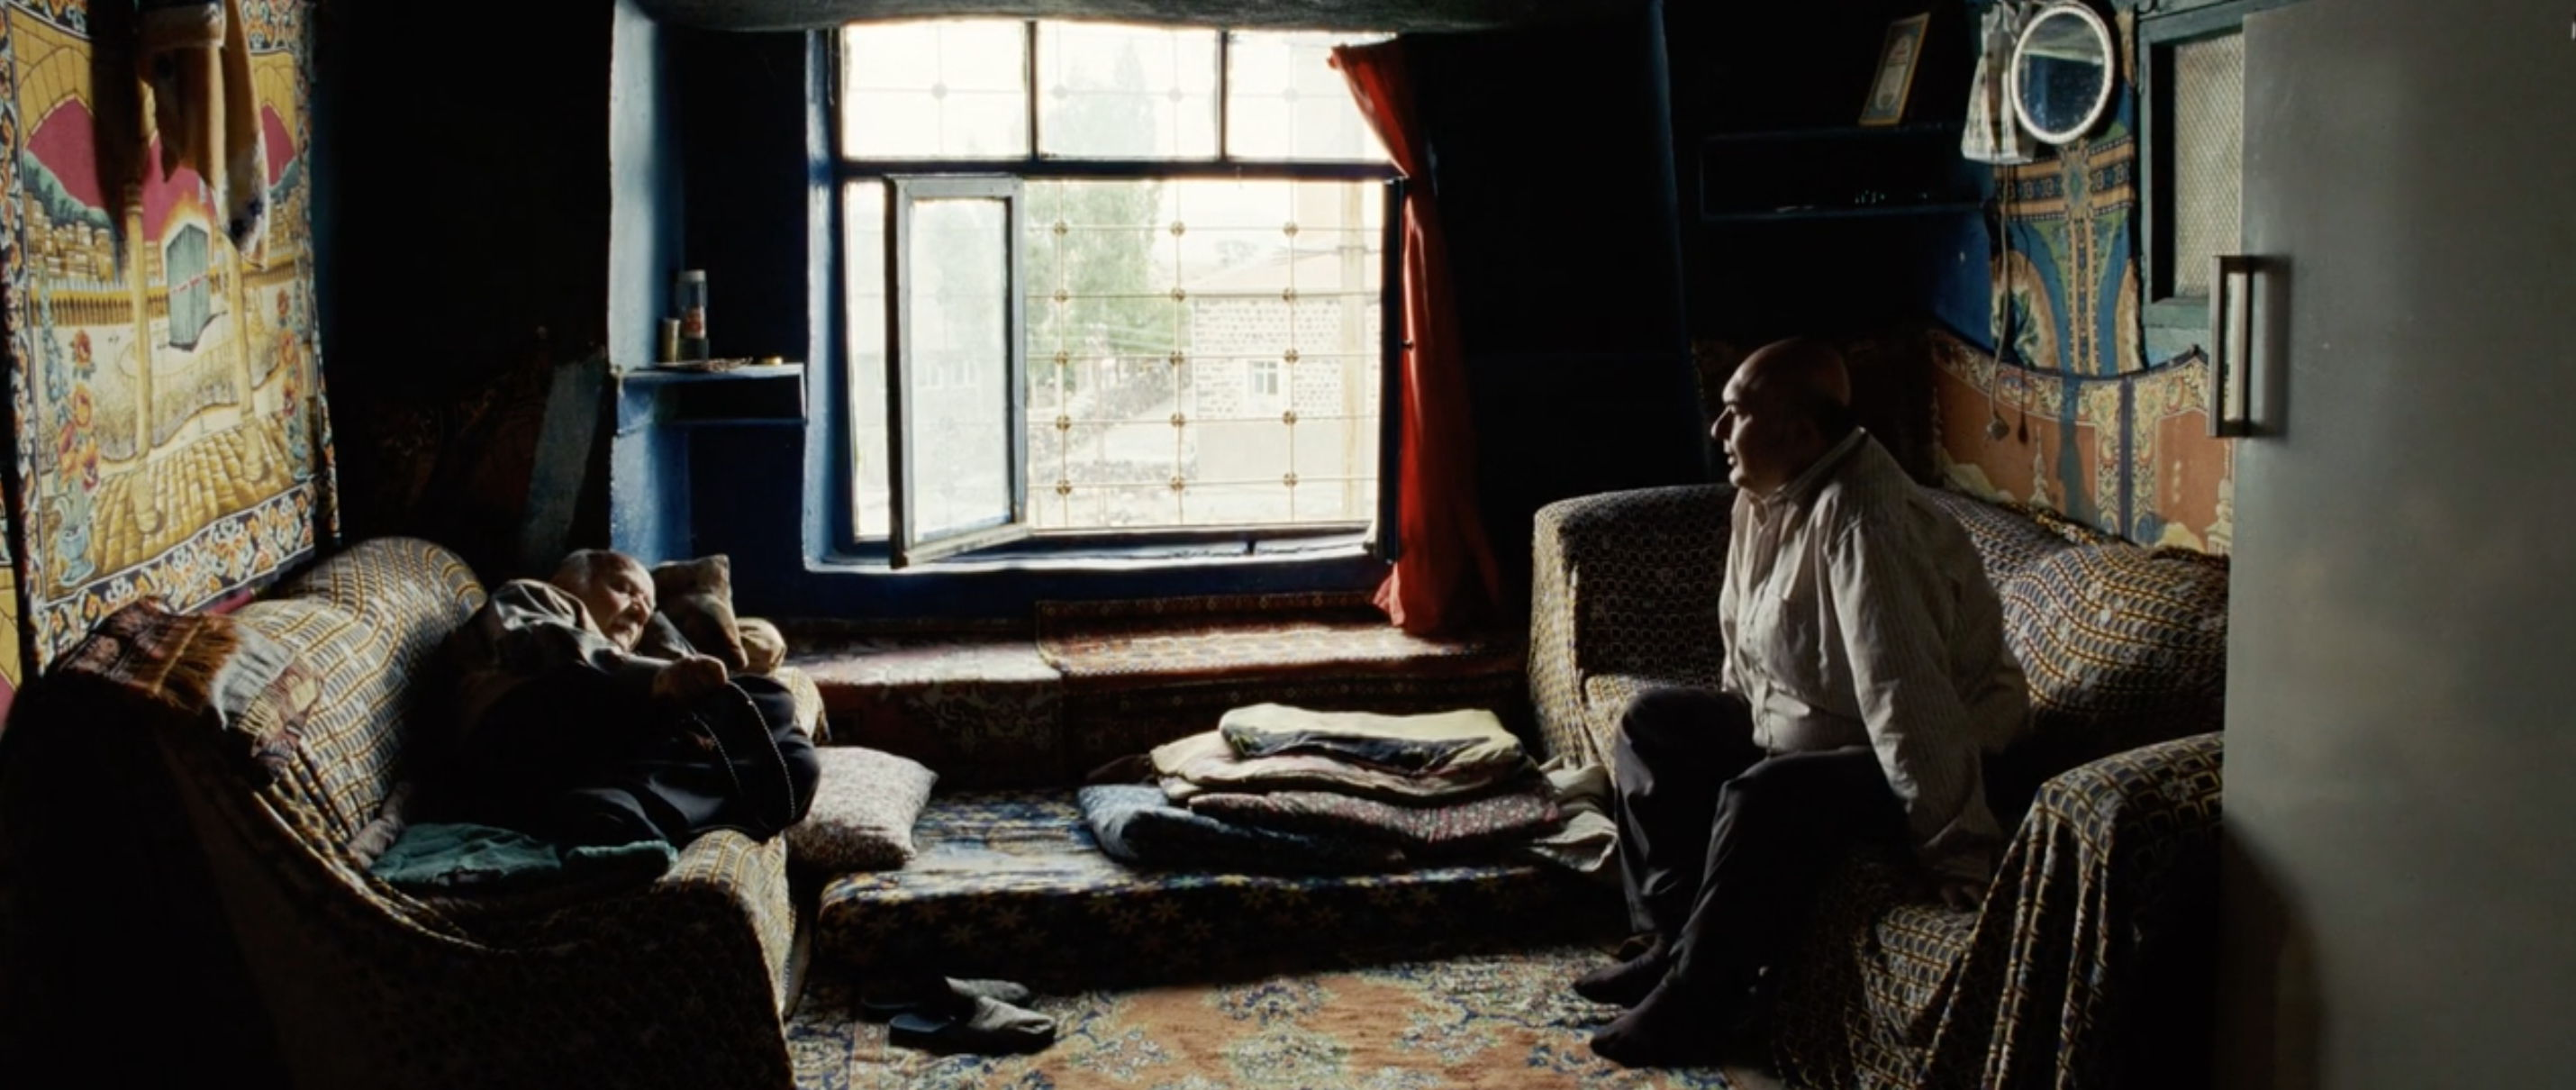 Die Fremde - When We Leave - Filmszene mit Umays Vater - Regie: Feo Aladag - Kamera Judith Kaufmann